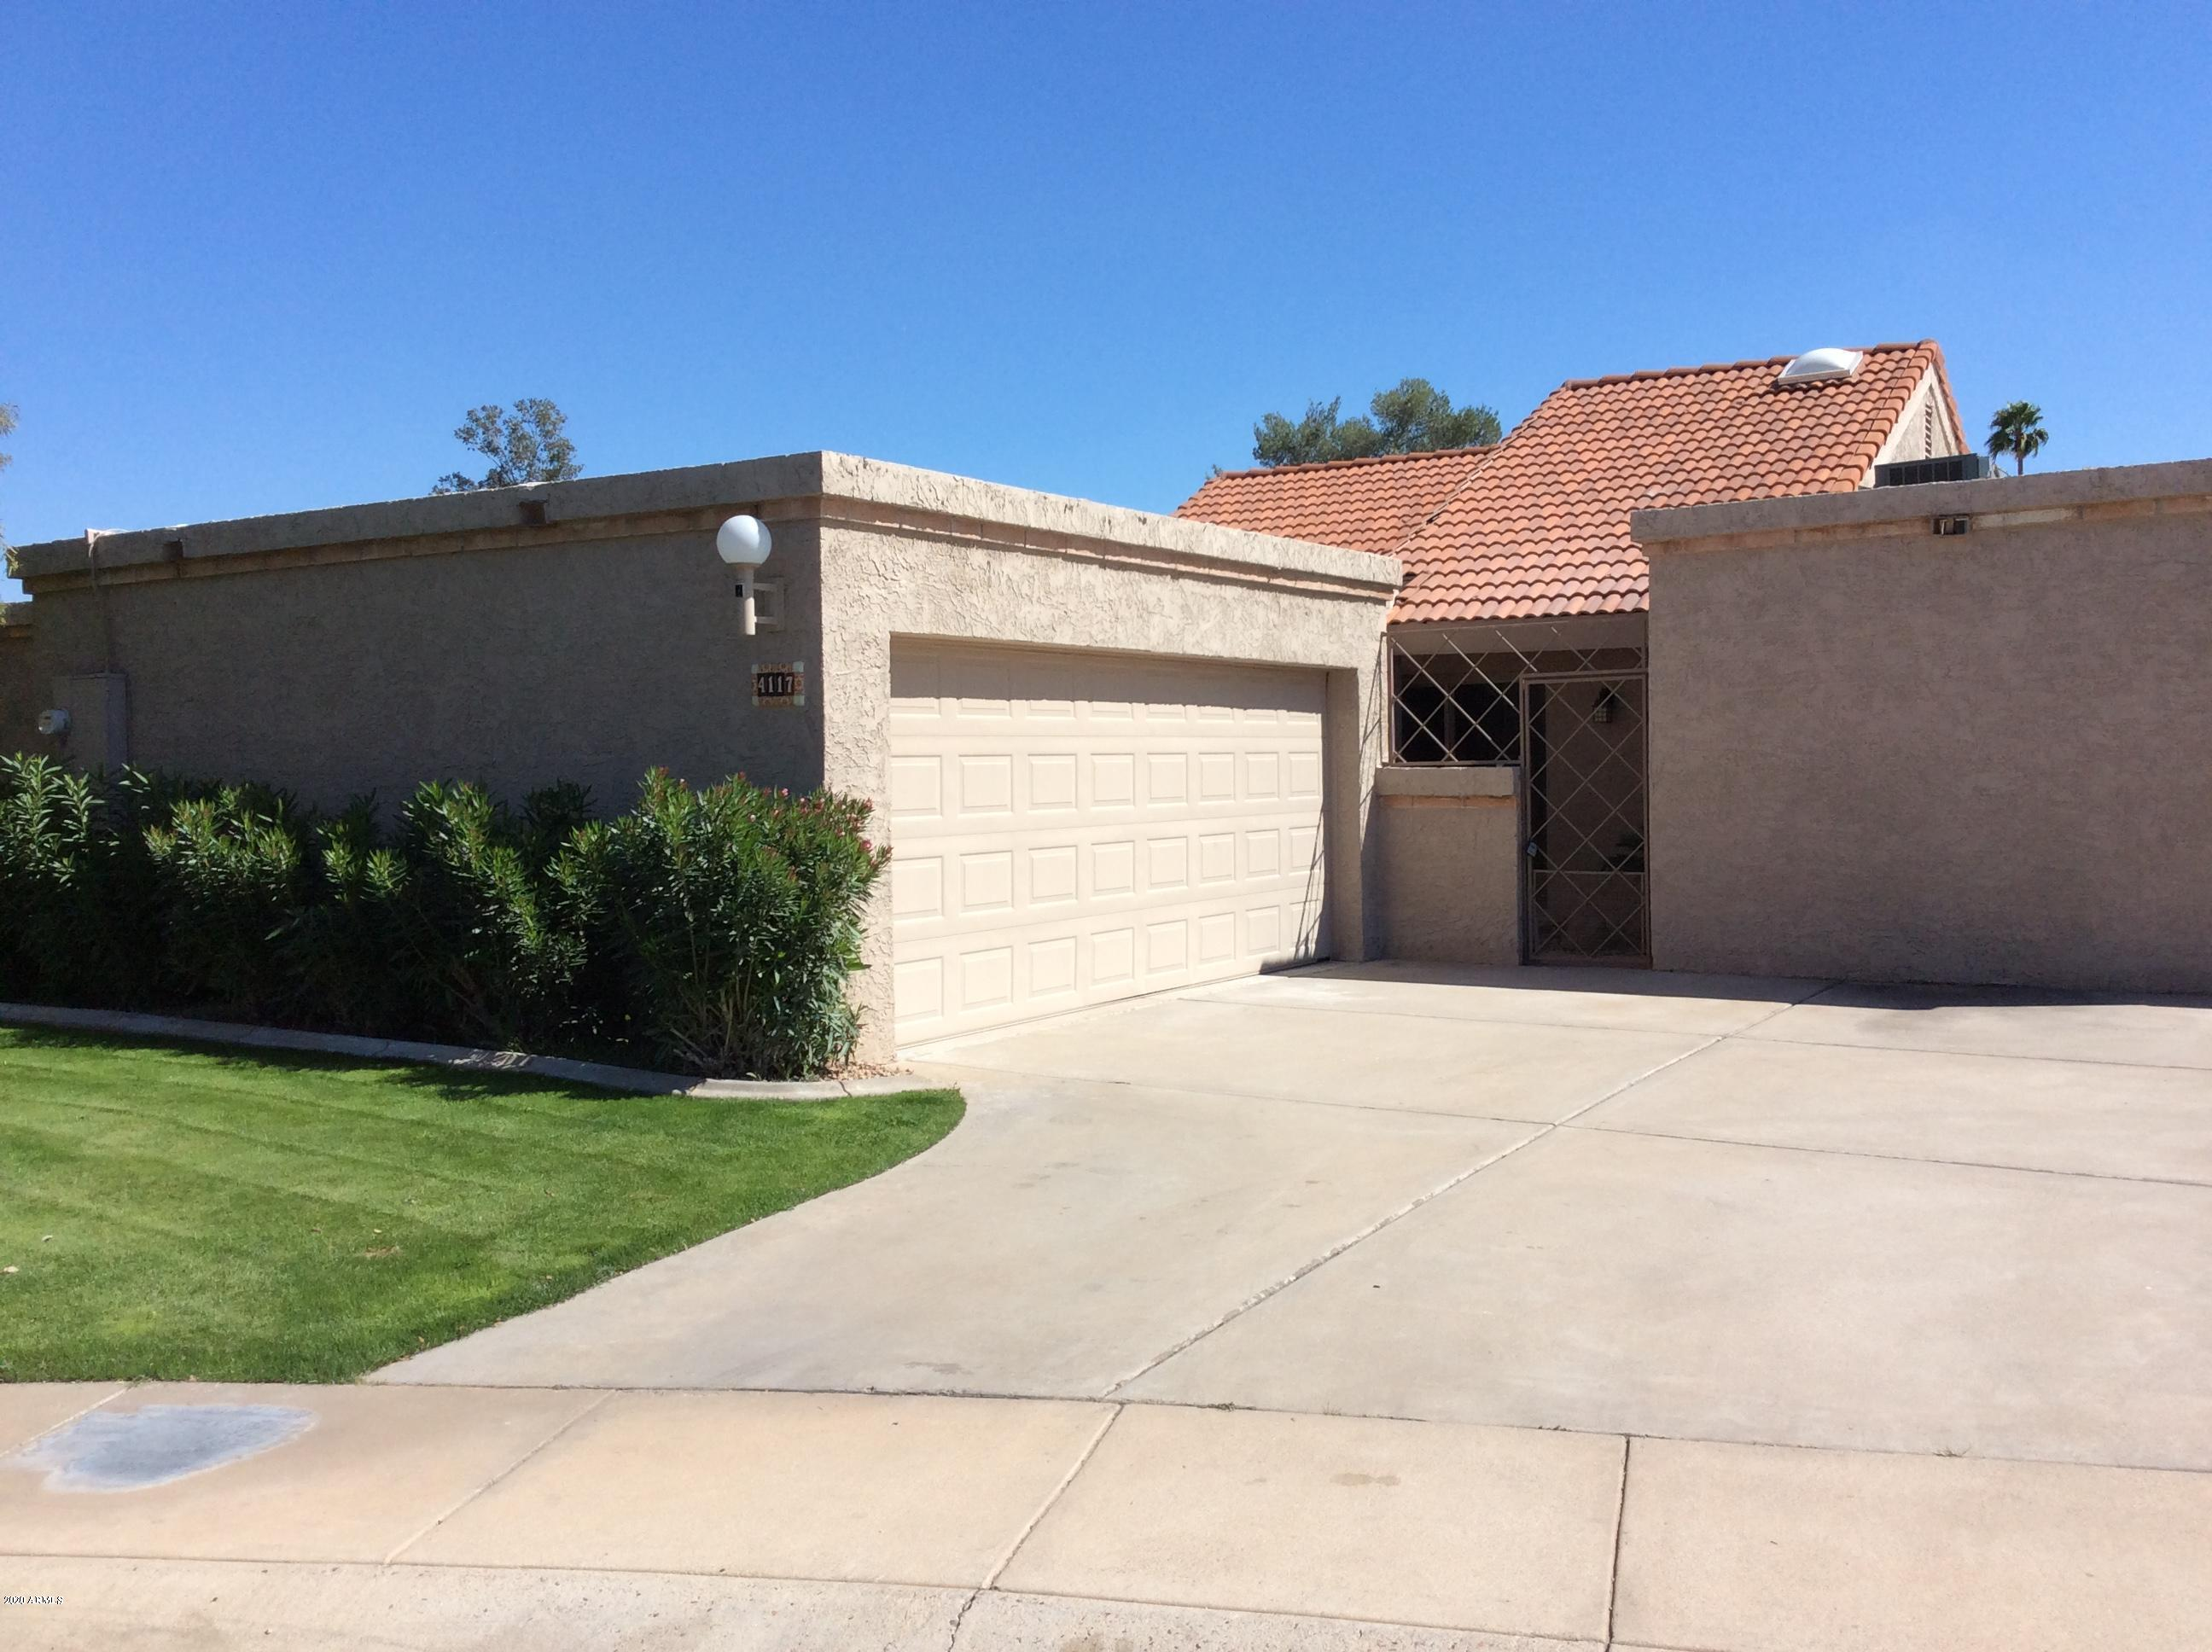 Photo of 4117 E COLUMBINE Drive, Phoenix, AZ 85032